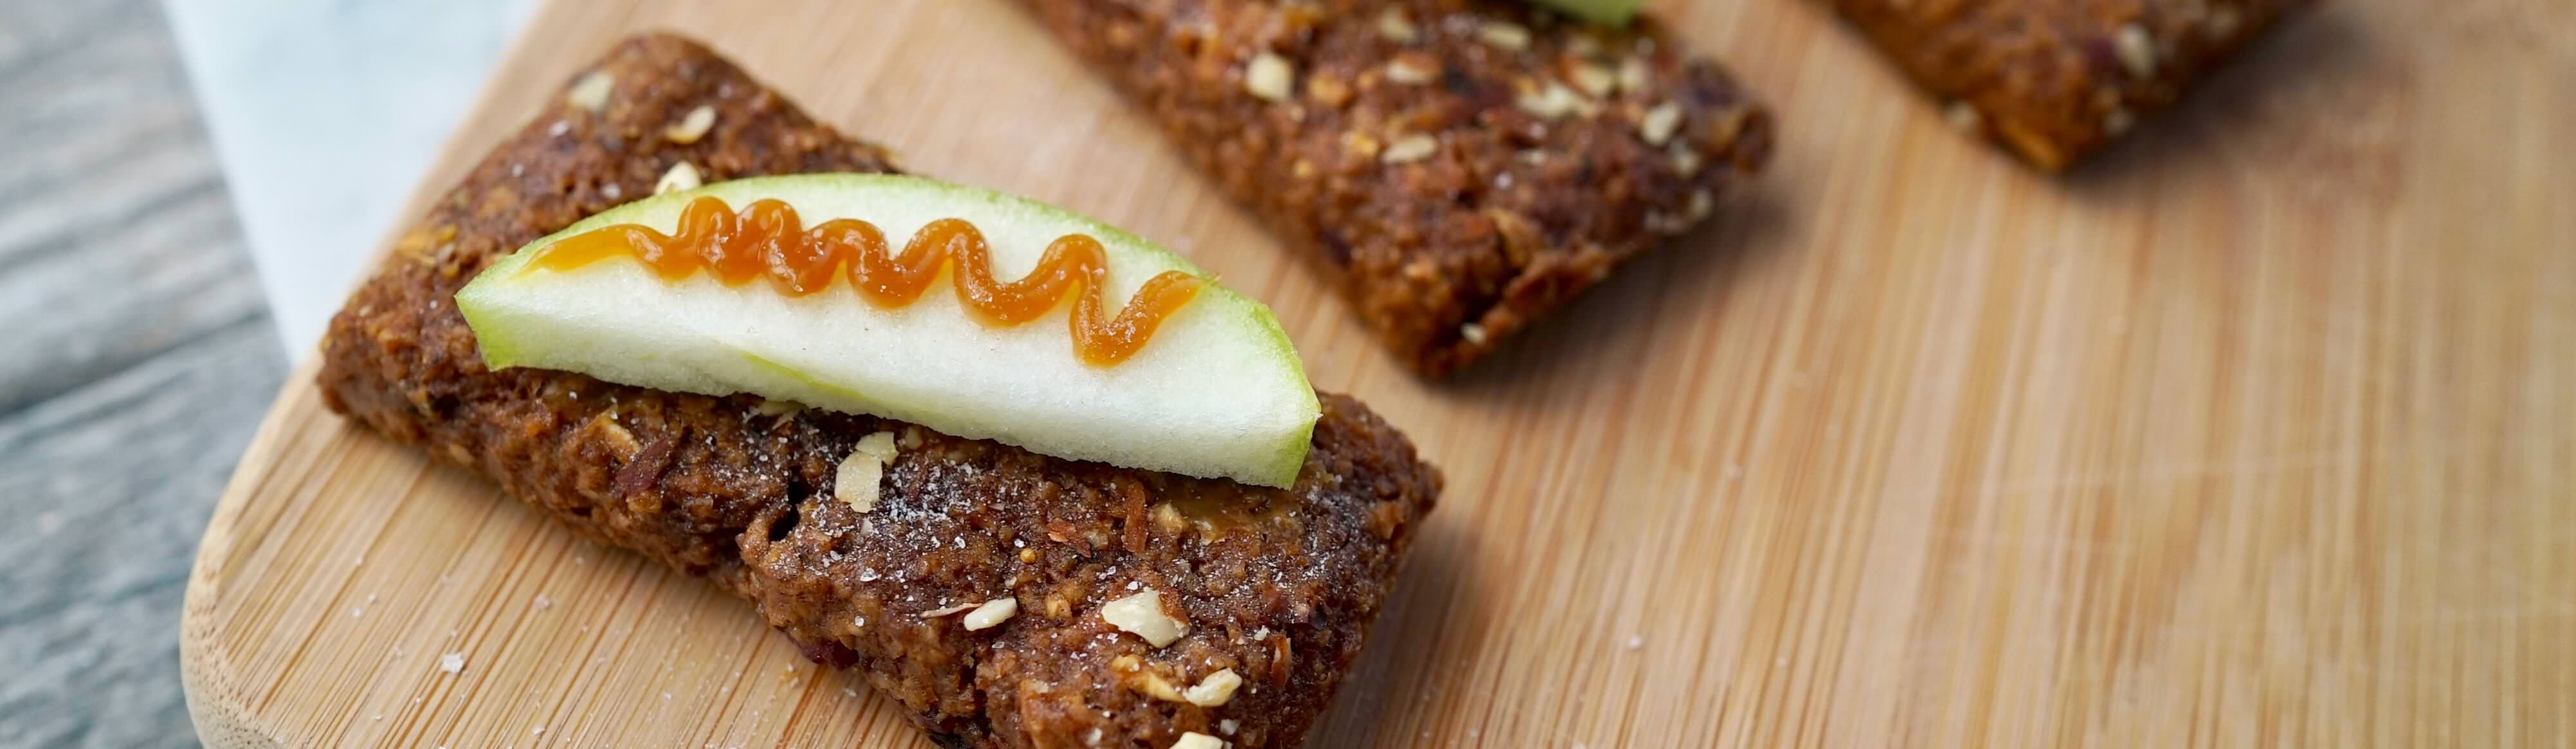 Caramel Apple Snack Bars